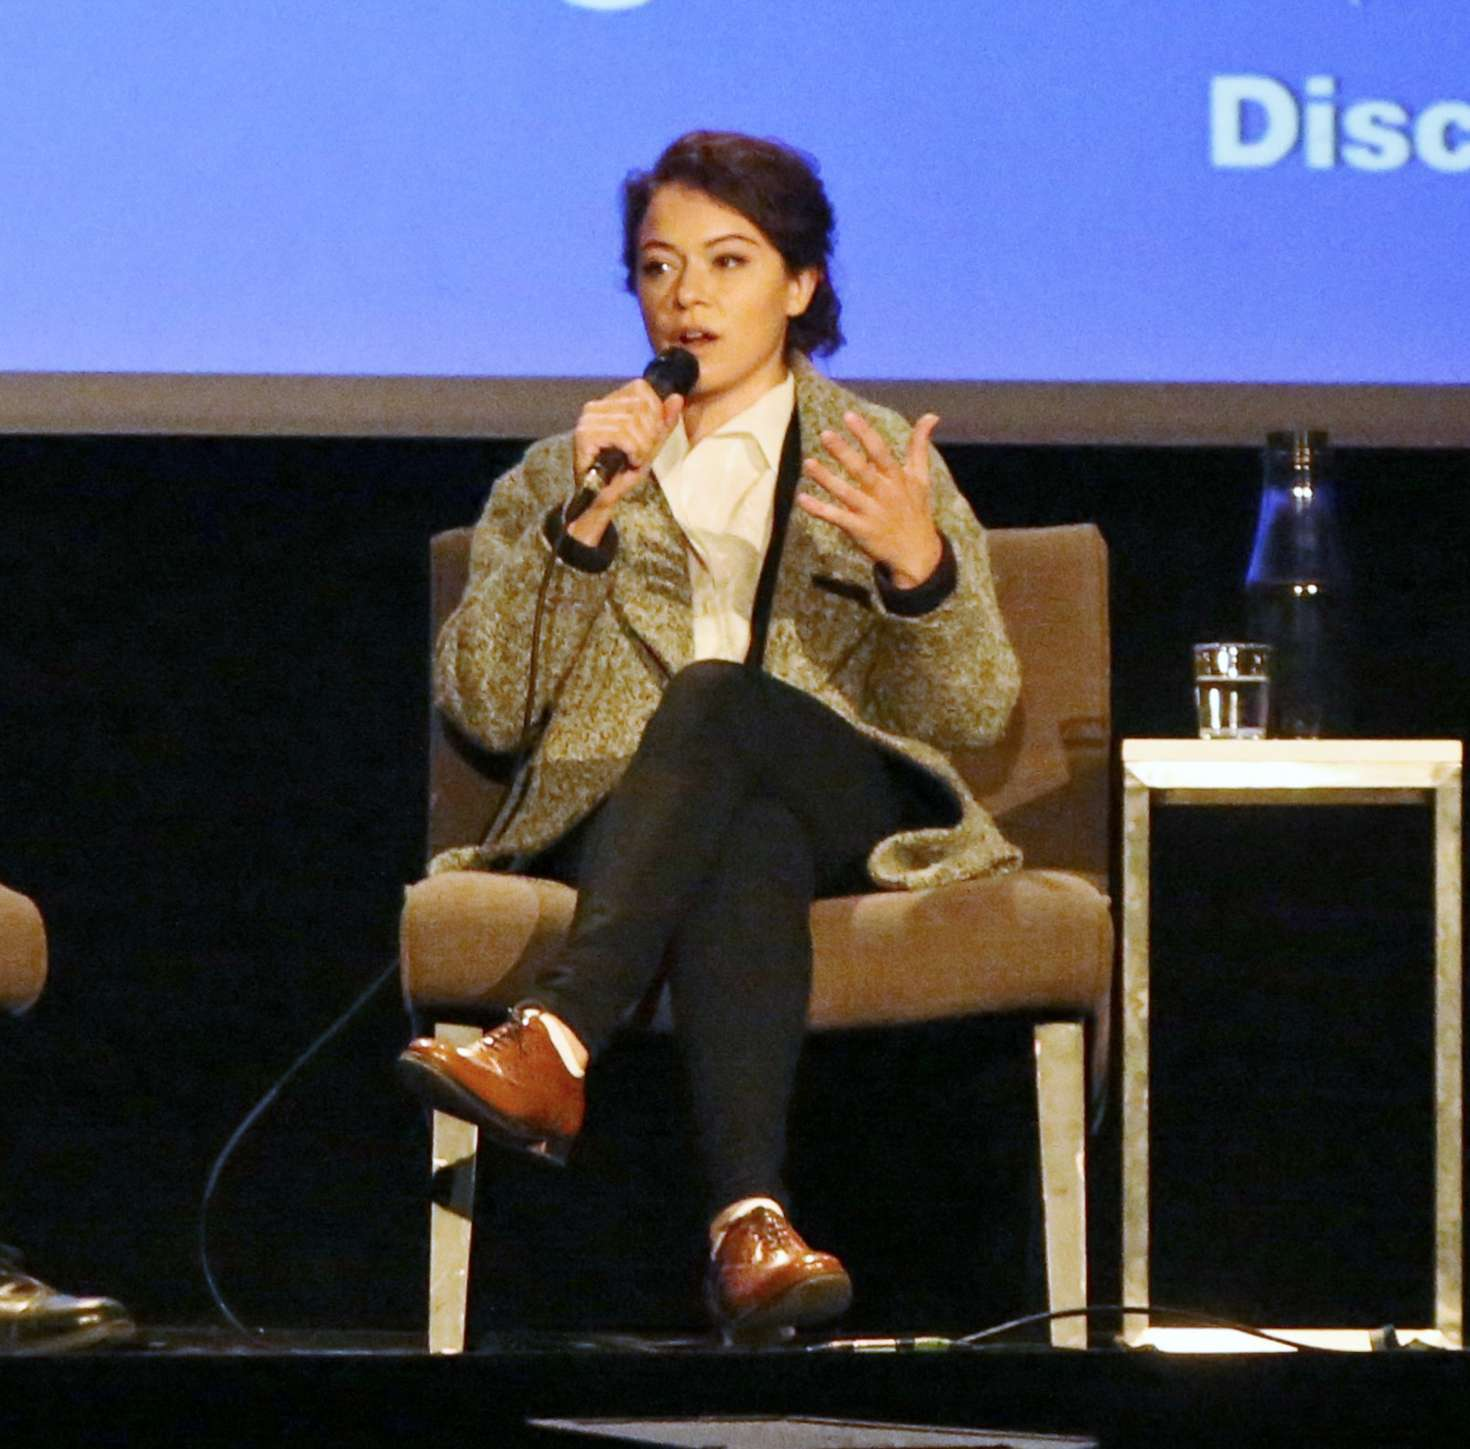 Uncategorized 2016 : Tatiana Maslany: Speaks at the VIFF in Vancouver-28